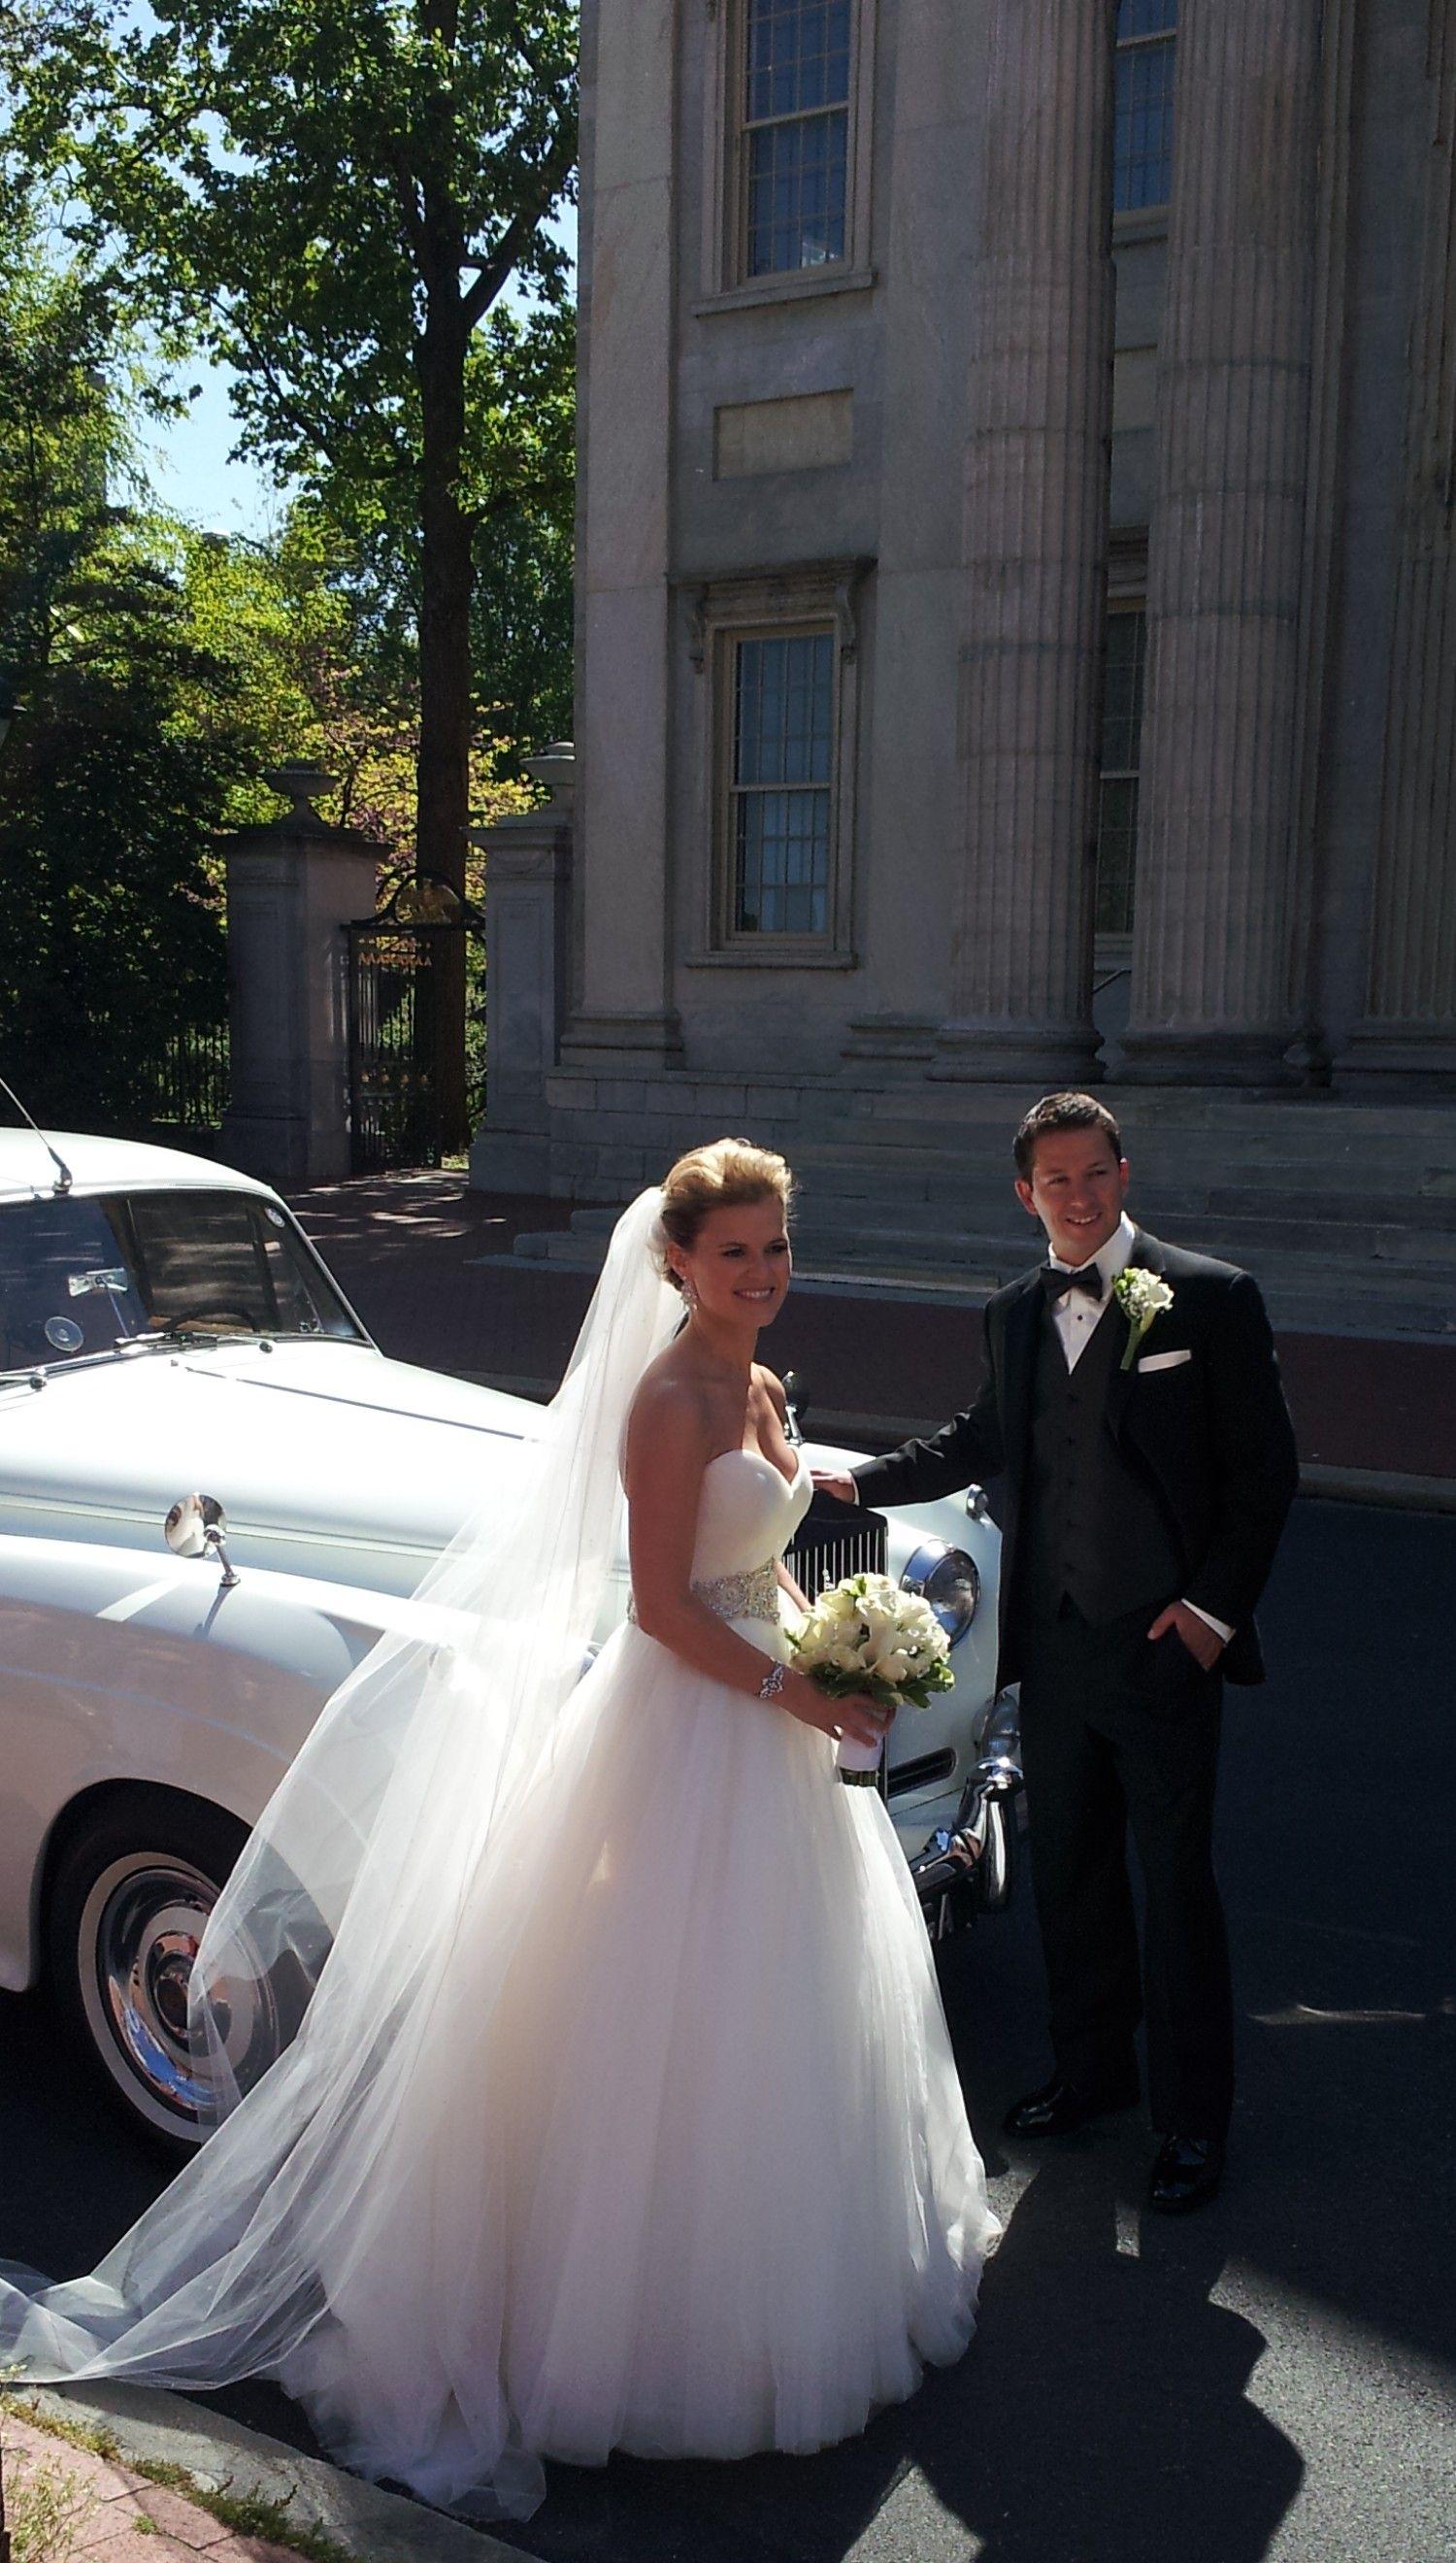 Olde City Wedding Wedding transportation, City wedding